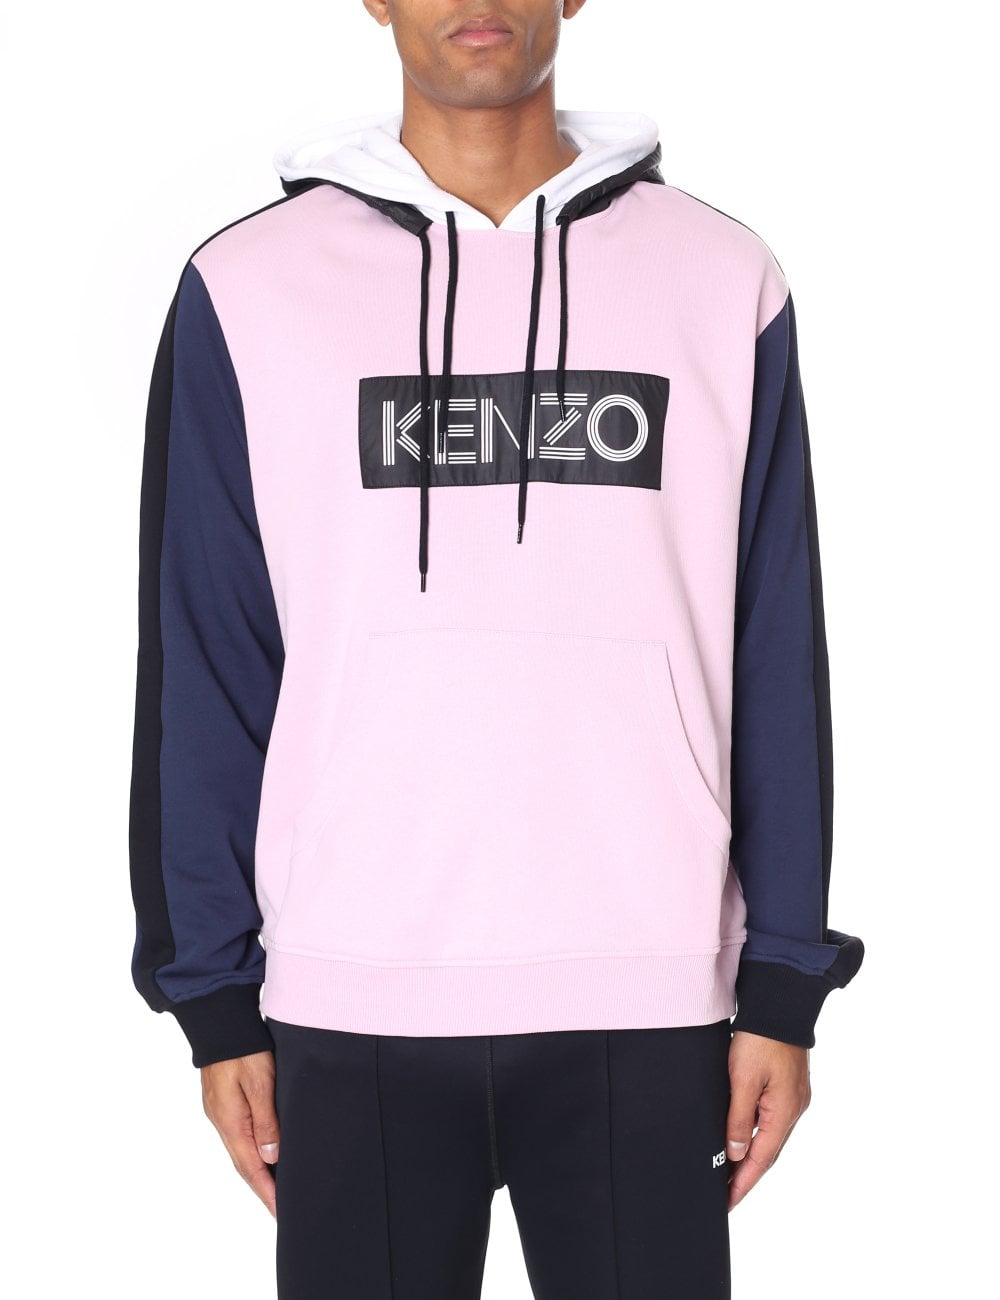 6f37459824 Kenzo Men's Kenzo Logo Colour Block Sweatshirt